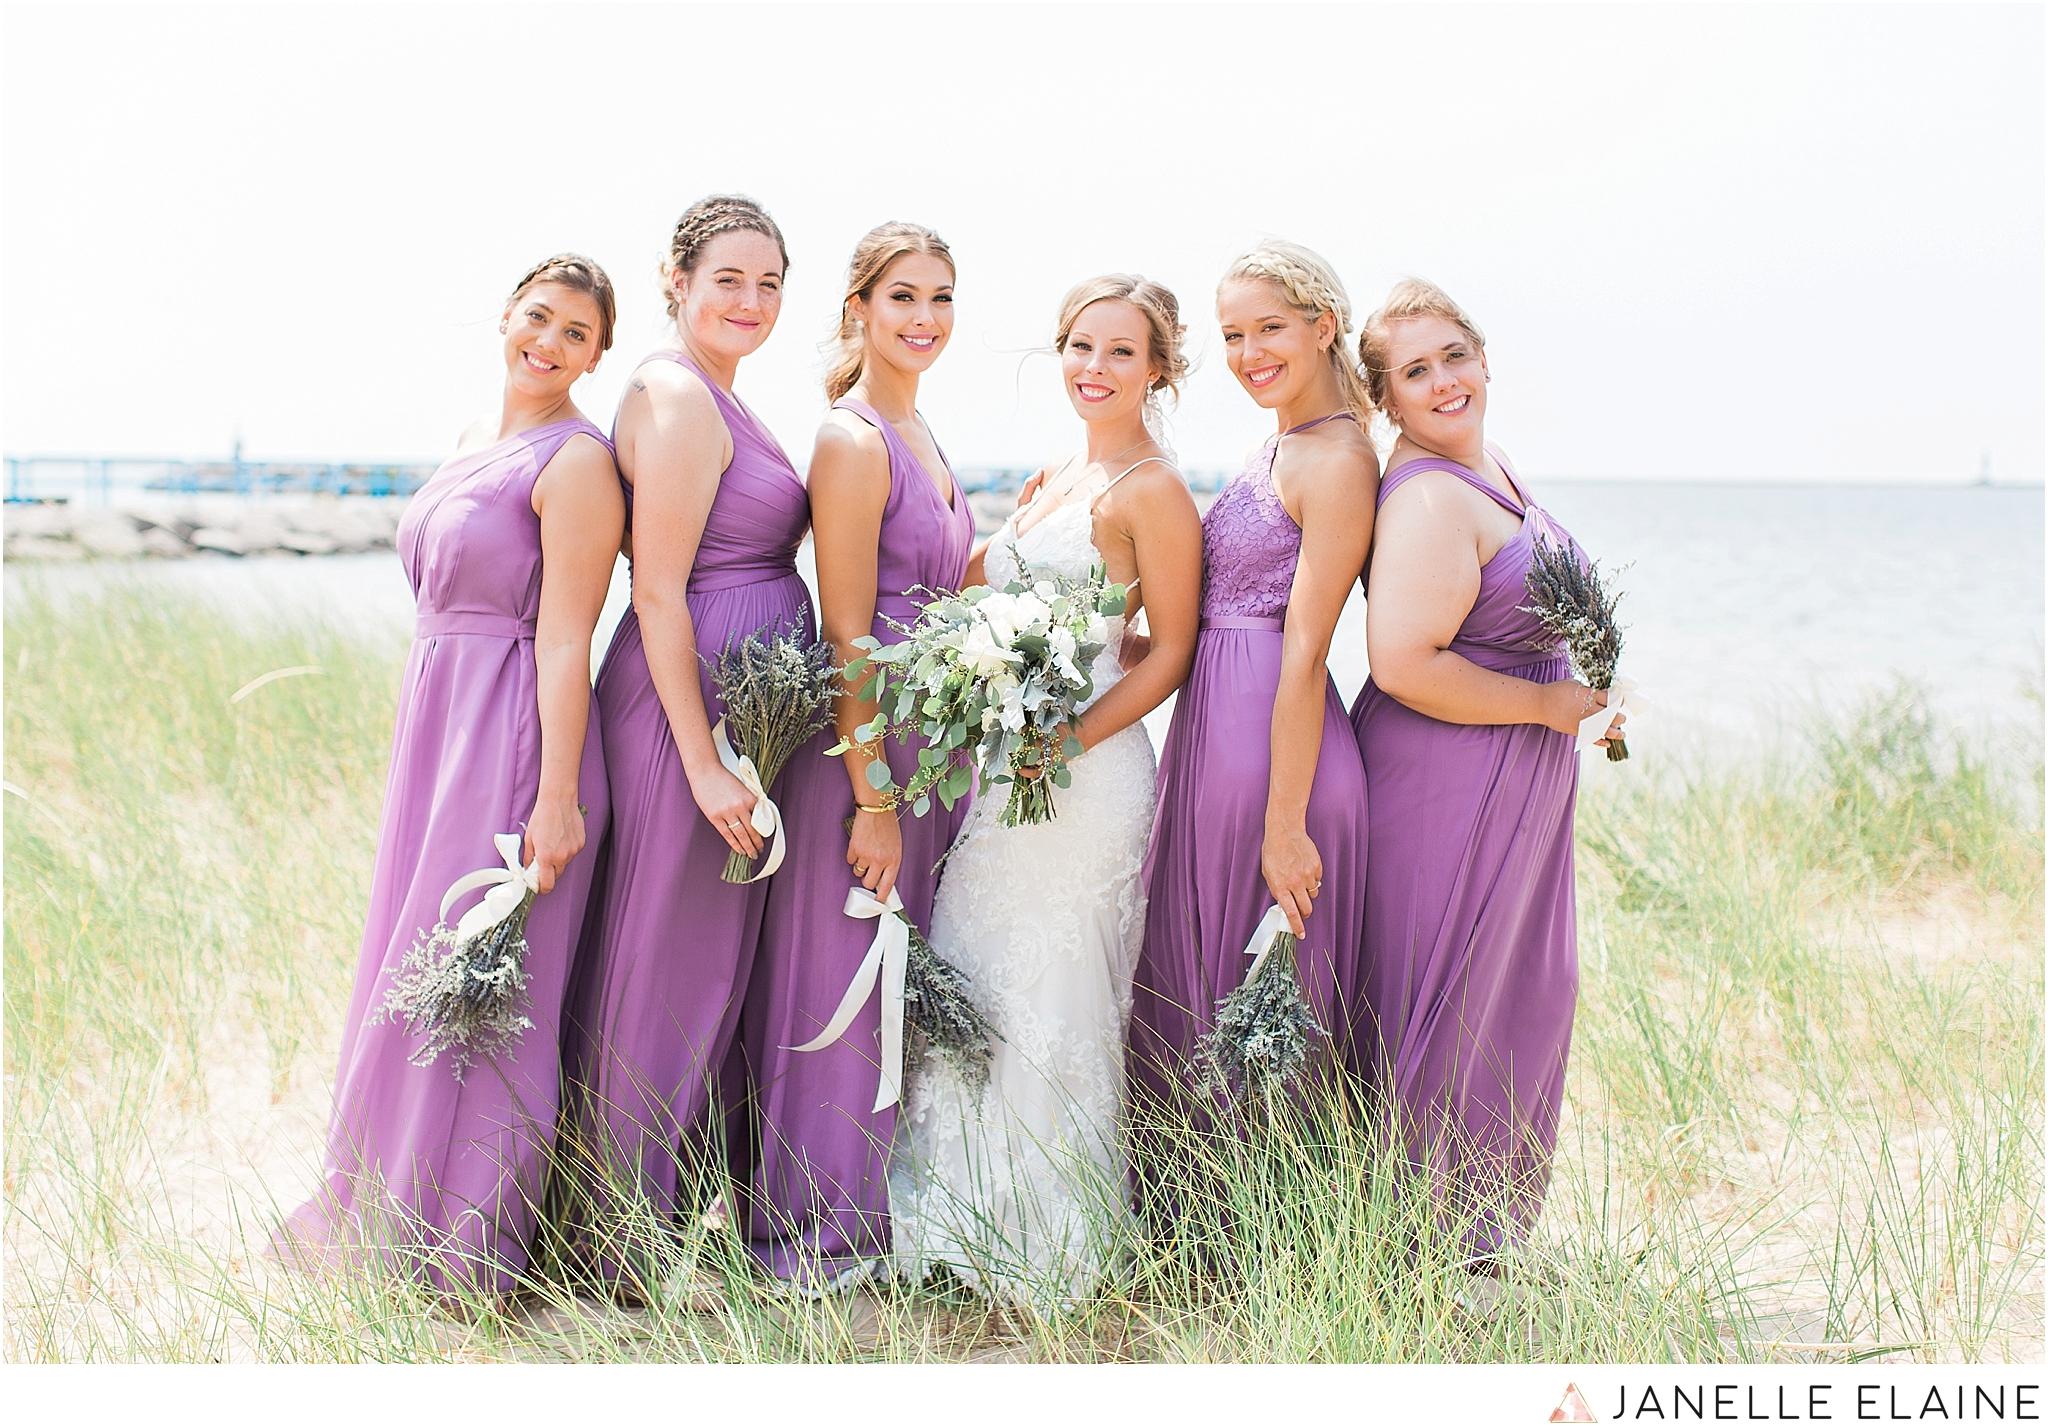 warnsholz-wedding-michigan-photography-janelle elaine photography-88.jpg